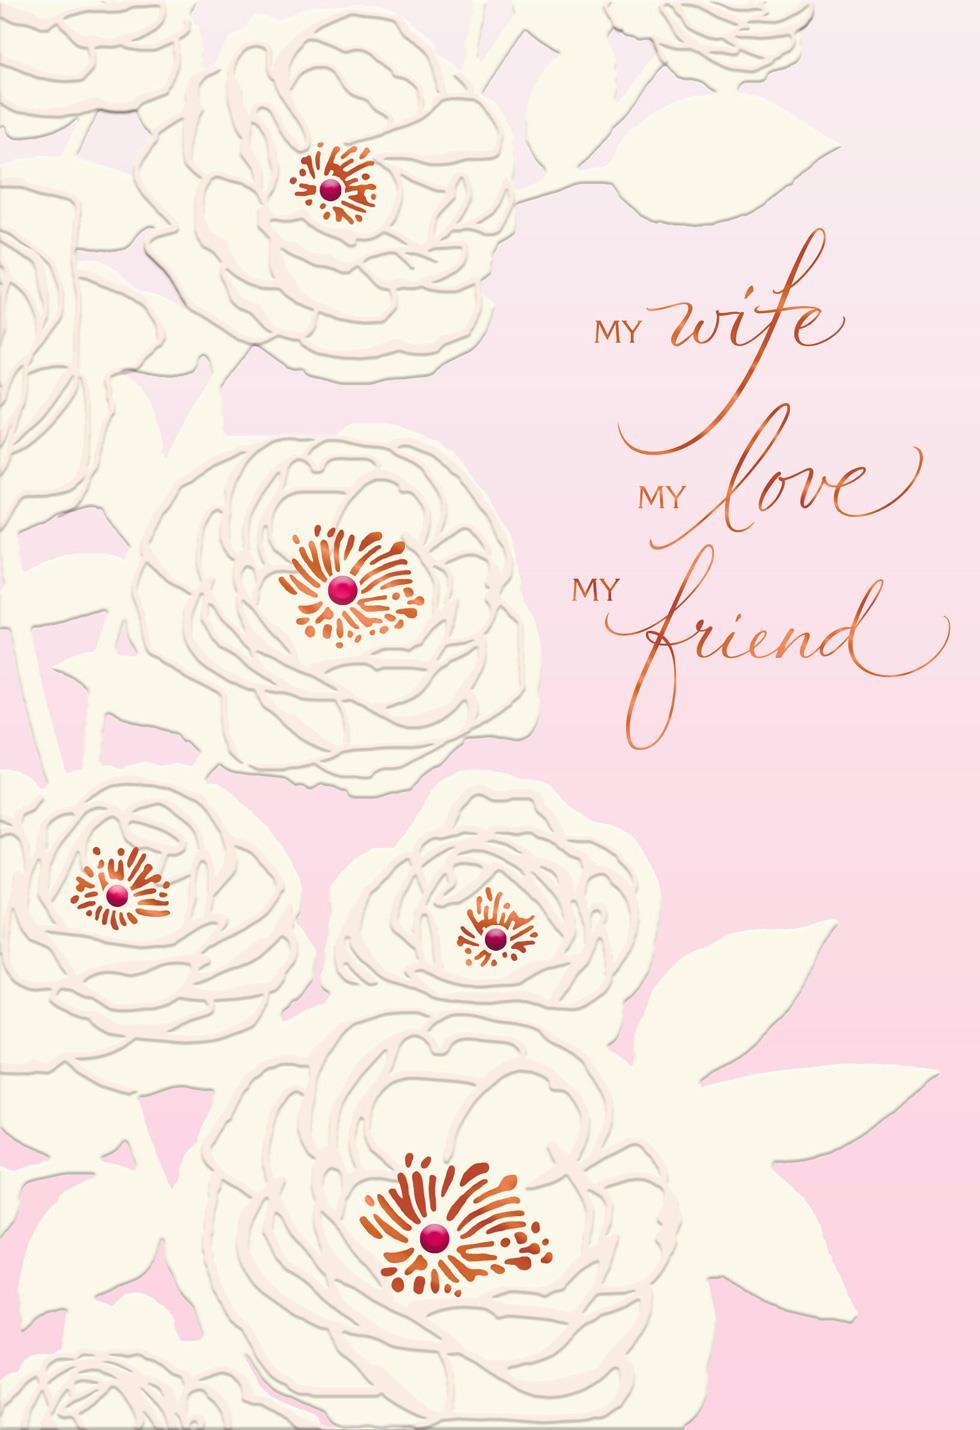 My Love Best Friend Birthday Card For Wife